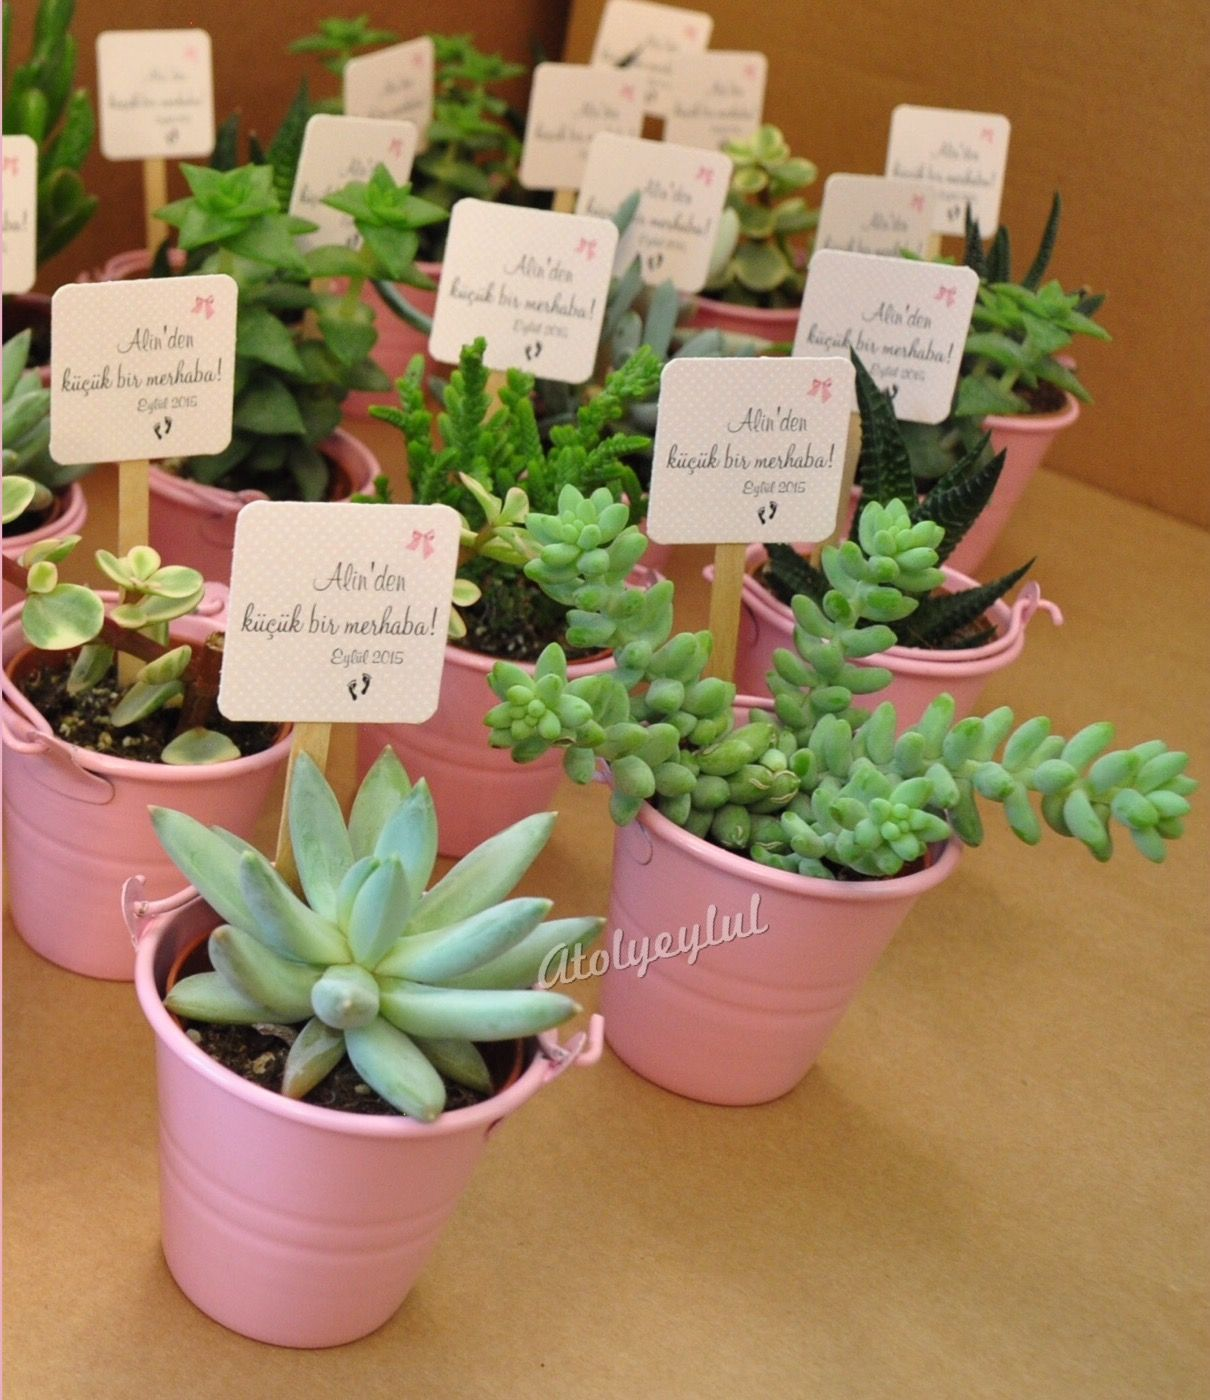 Mini sukulent, mini succulent, kaktüs, cactus, wedding